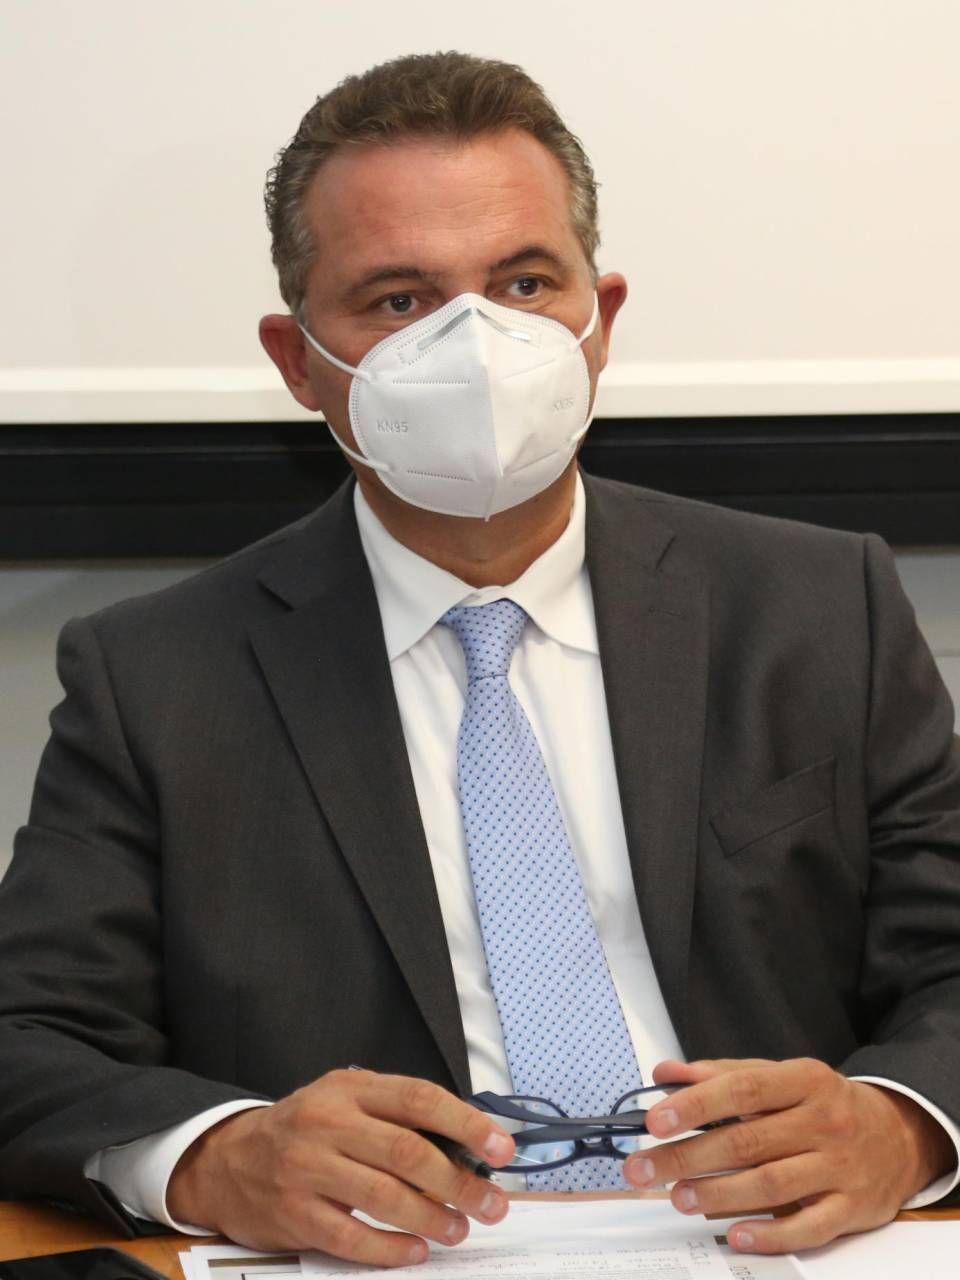 L'assessore regionale Raffaele Donini